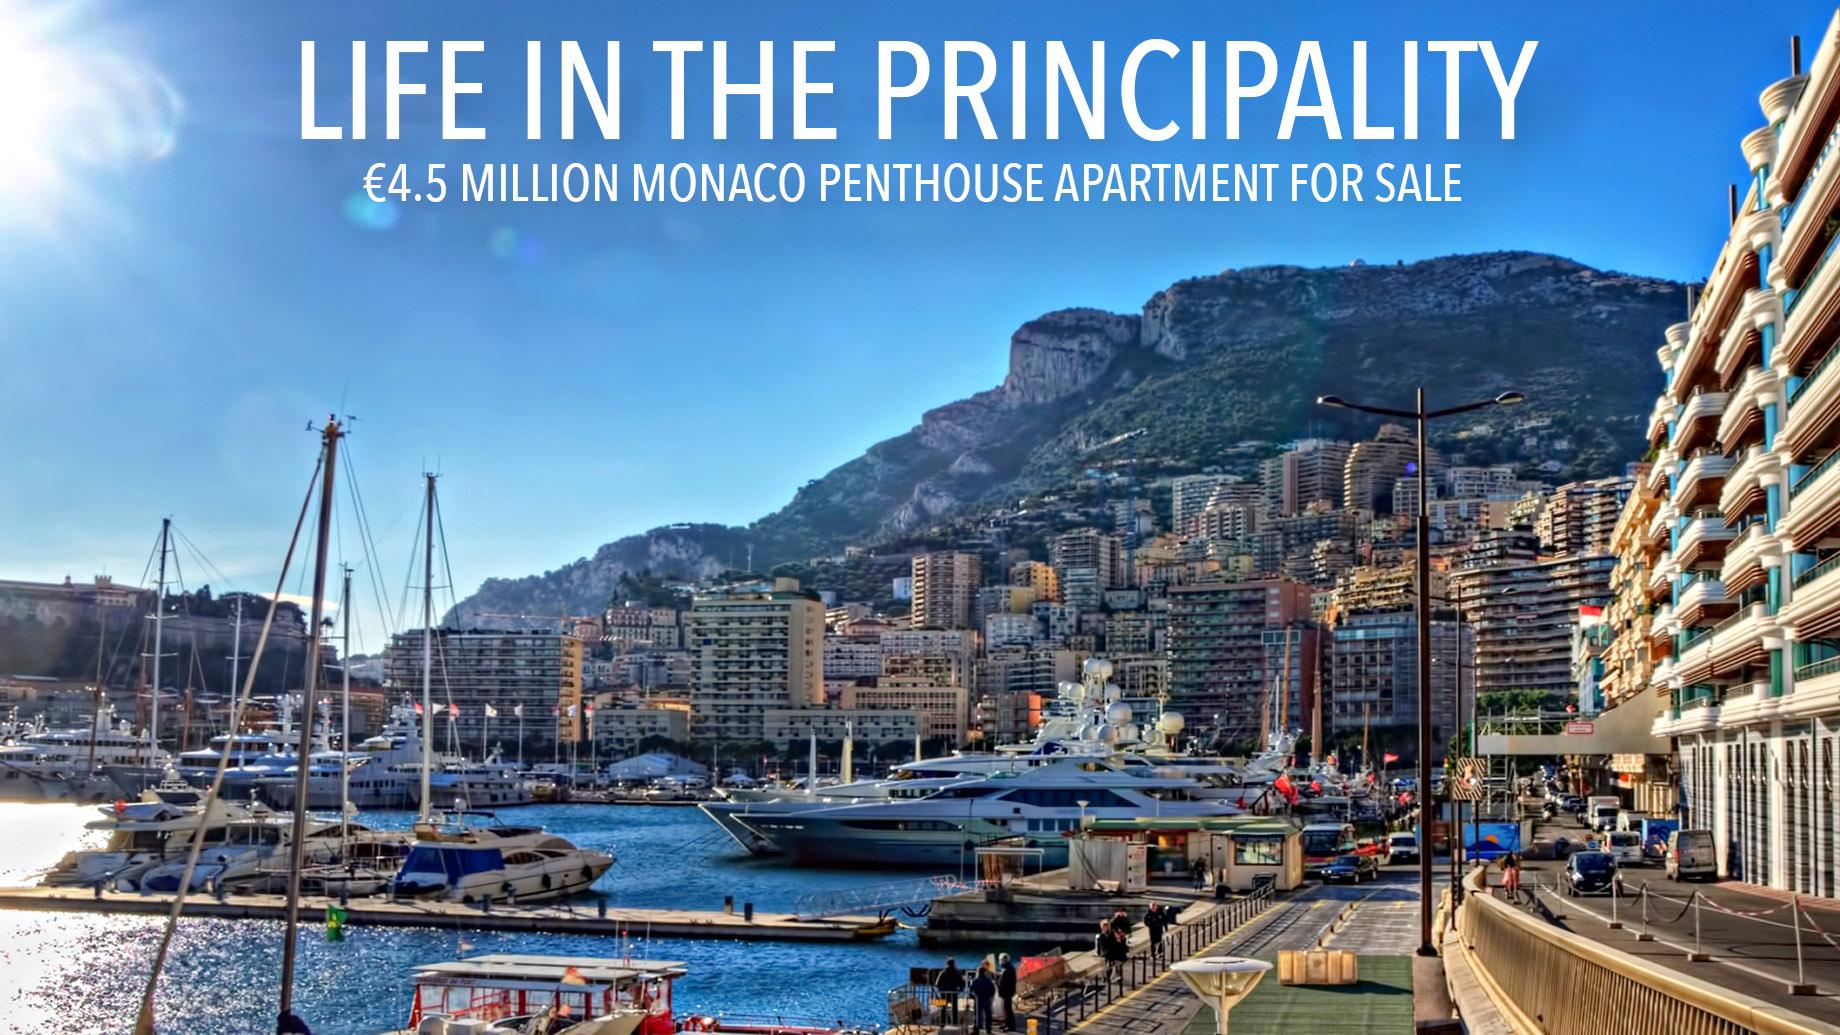 Life in the Principality - €4.5 Million Monaco Penthouse Apartment